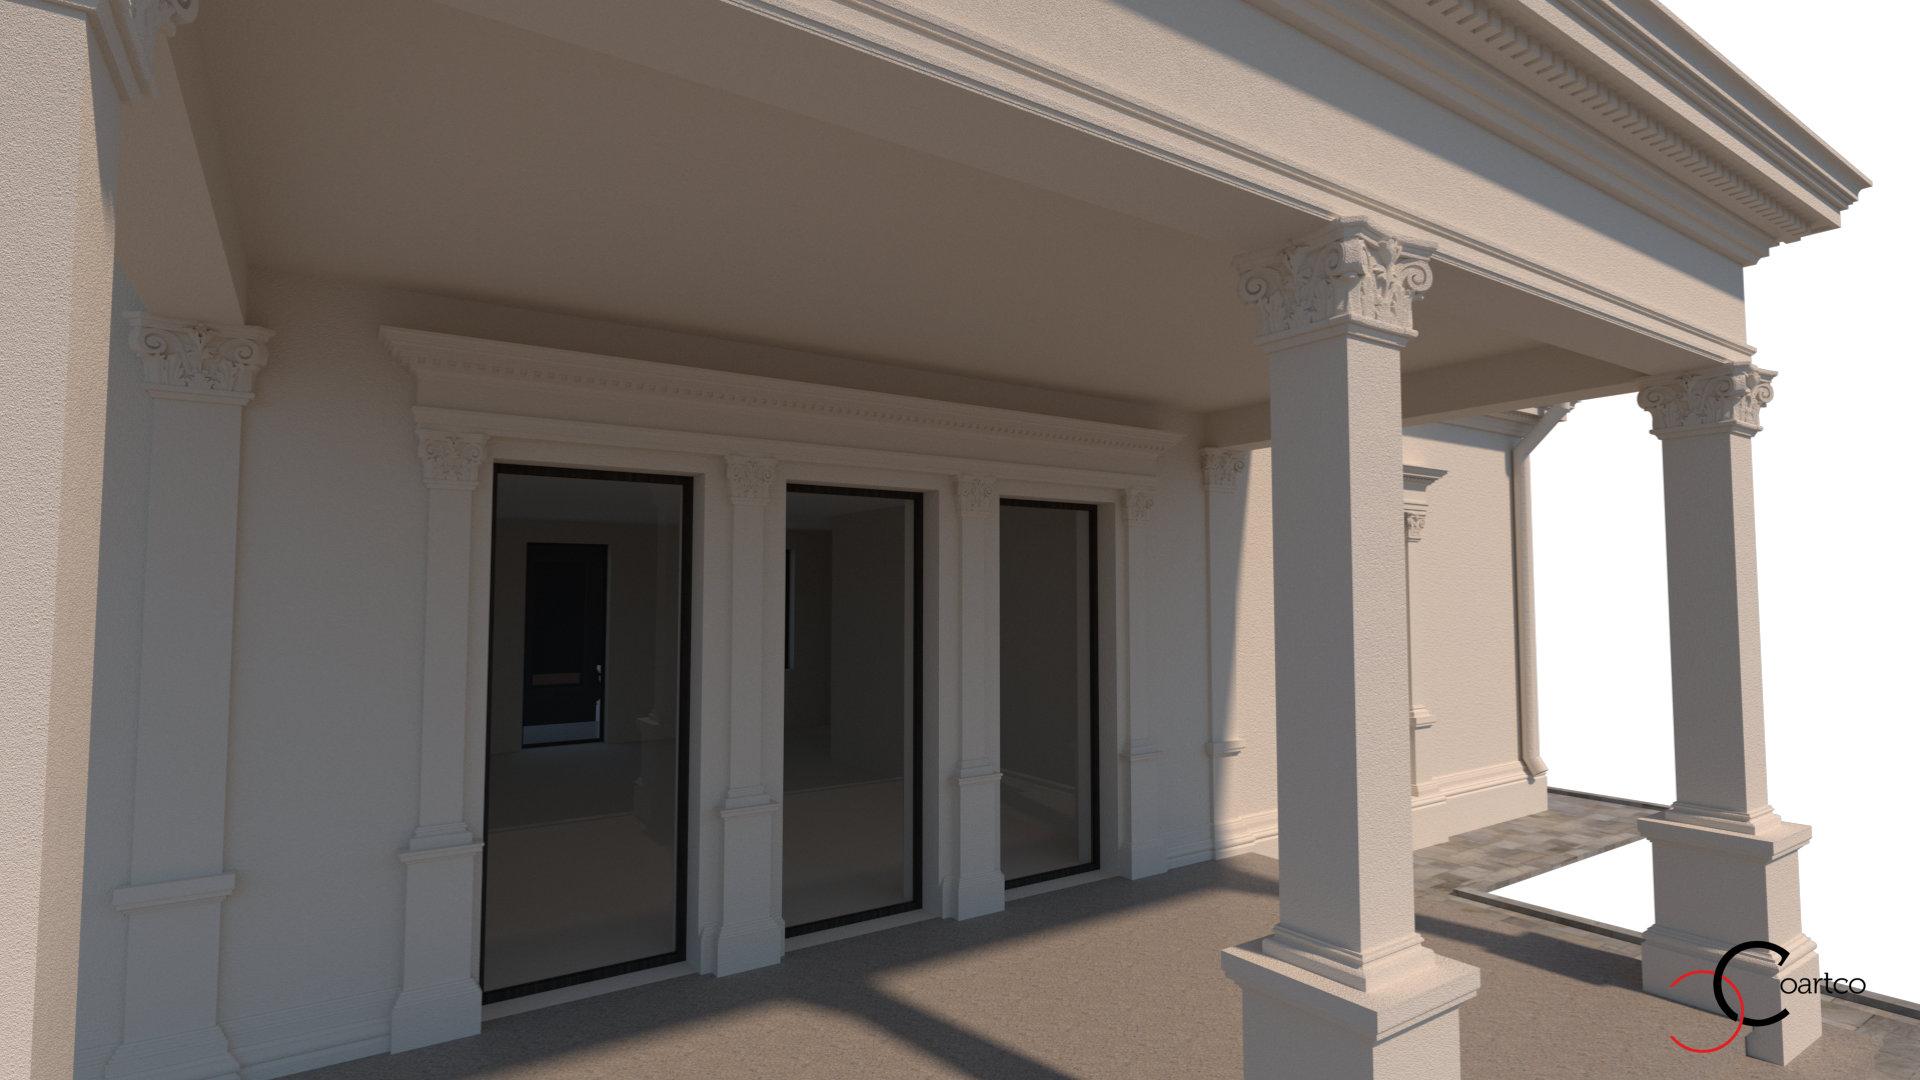 coloane-patrate-pentru-proiect-terasa